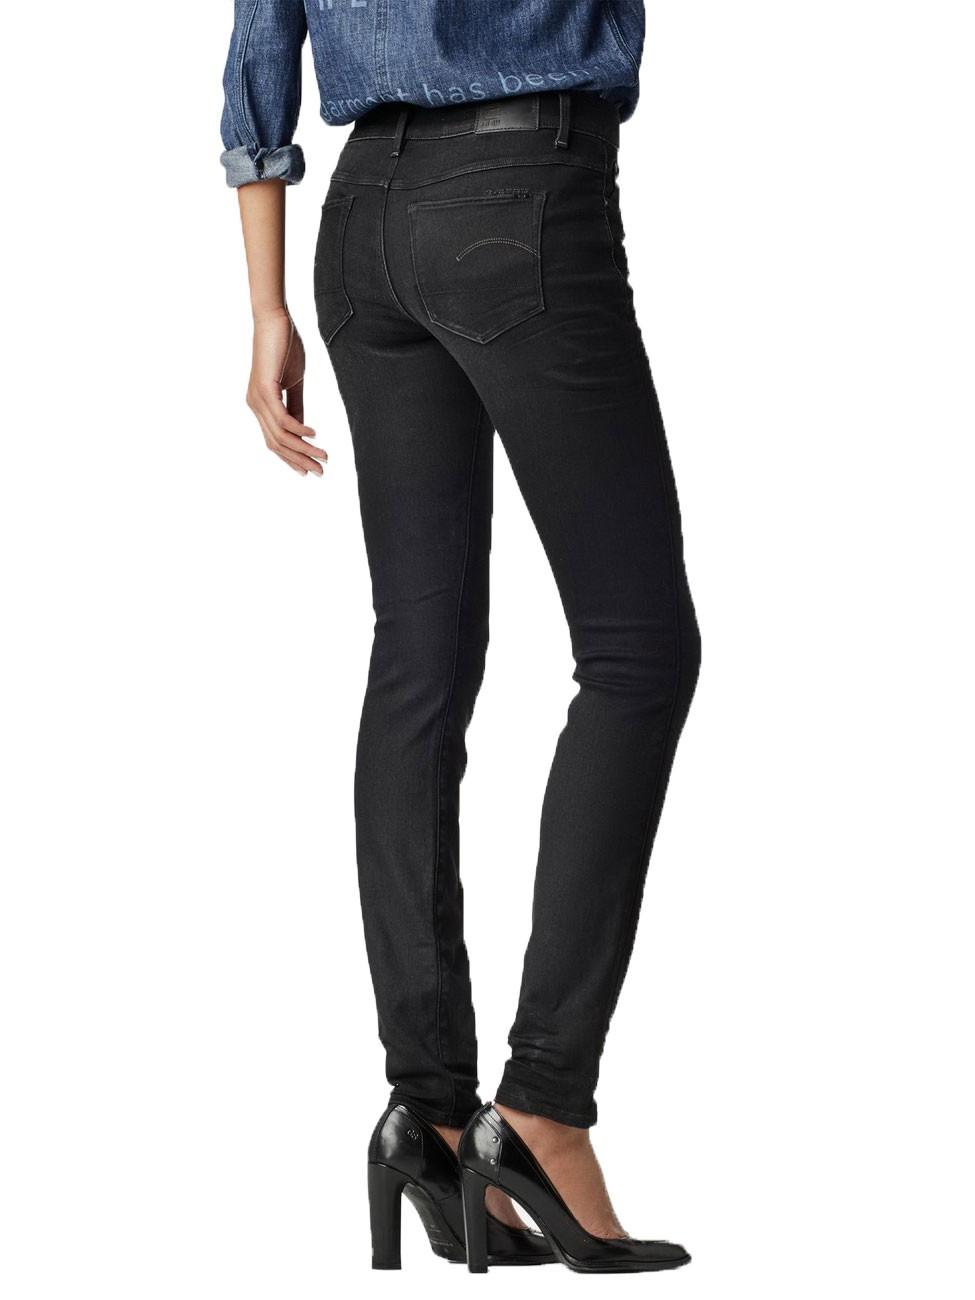 g star damen jeans 3301 contour damen high waist skinny jeans blau dark aged kaufen jeans. Black Bedroom Furniture Sets. Home Design Ideas